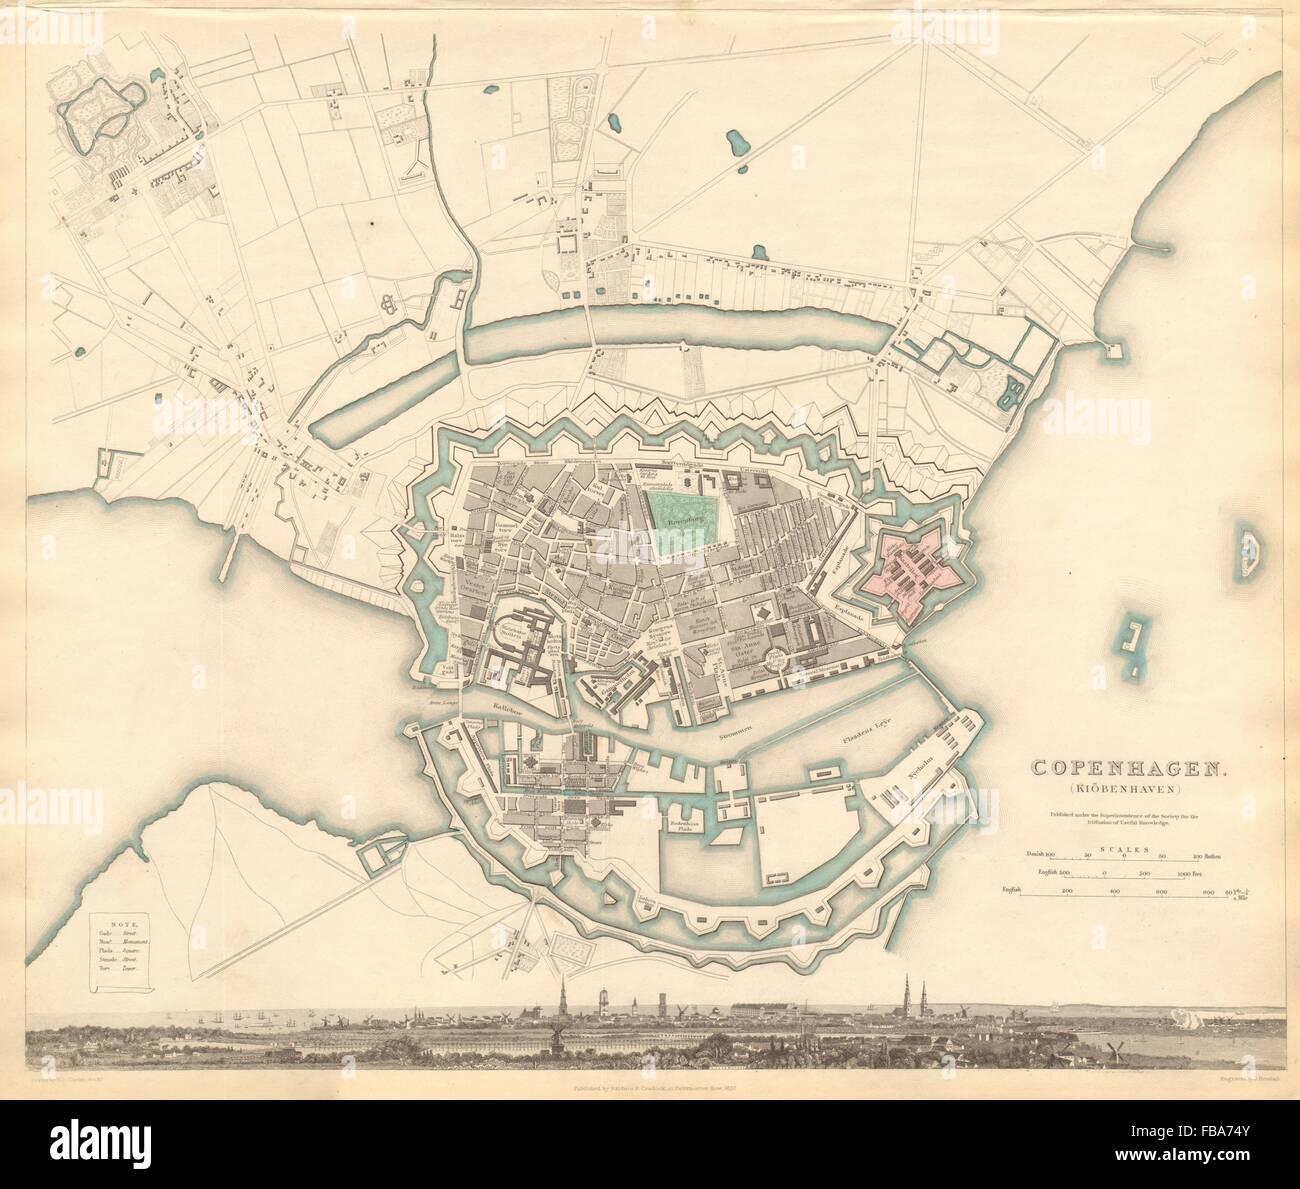 COPENHAGEN KIOBENHAVEN KOBENHAVEN KØBENHAVN. Town city map plan. SDUK, 1844 - Stock Image